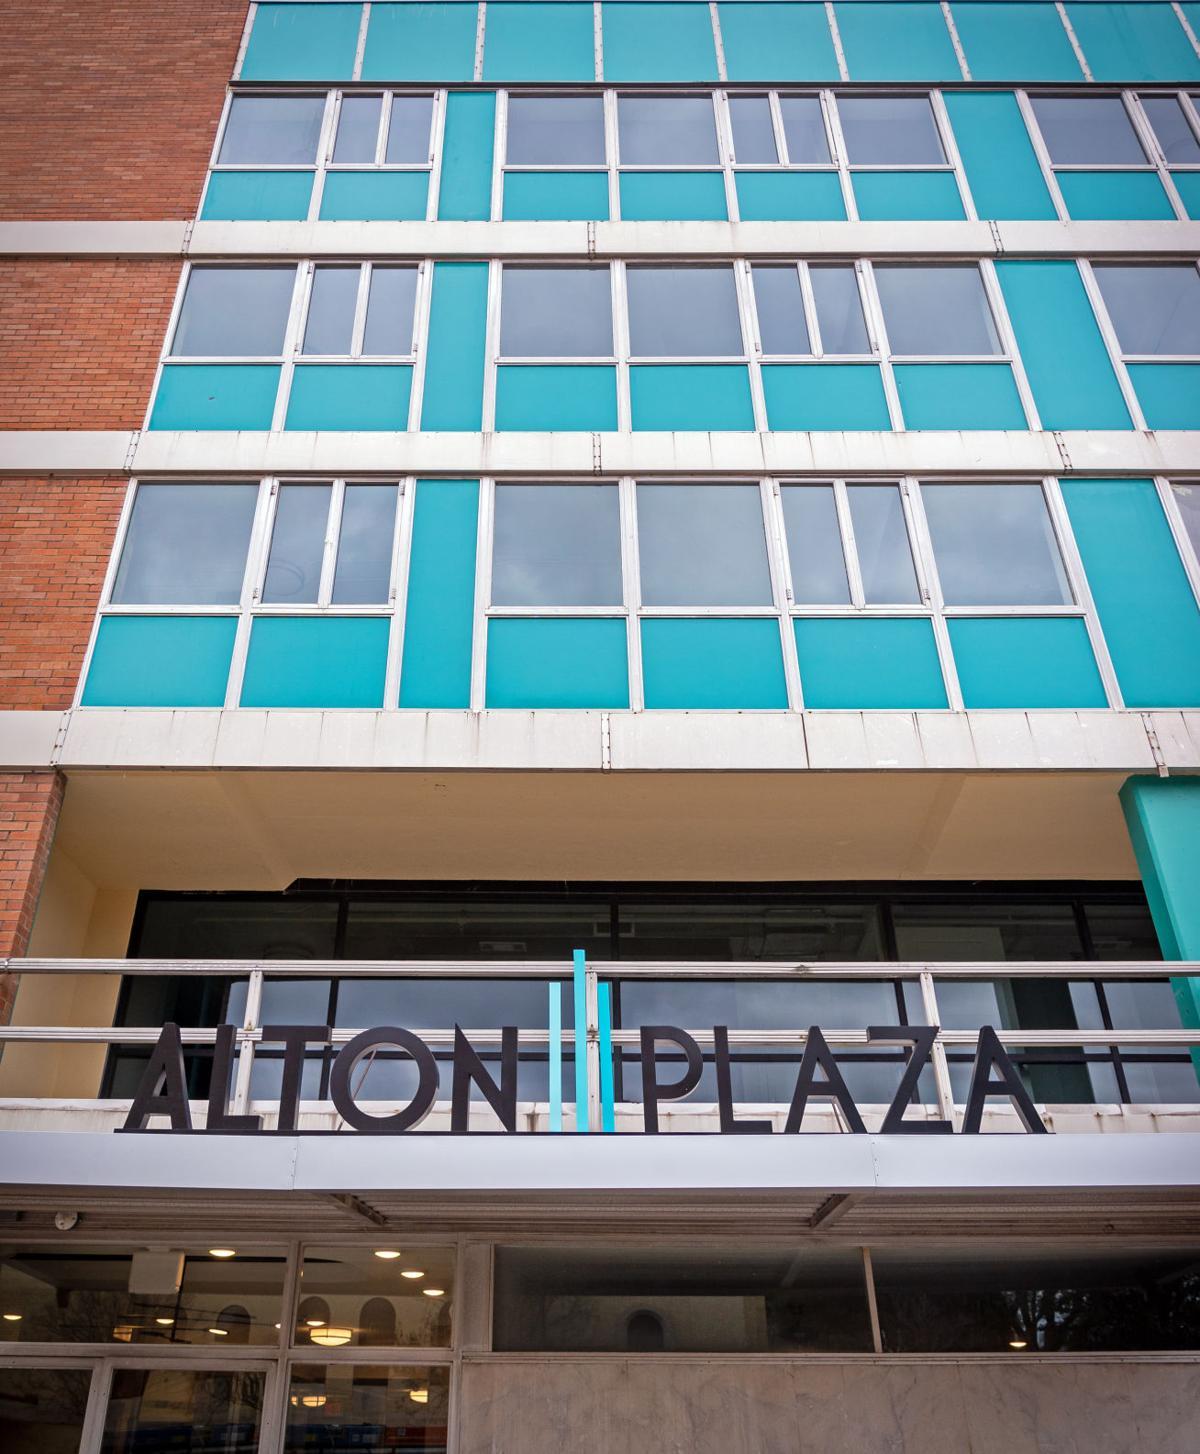 Alton Plaza